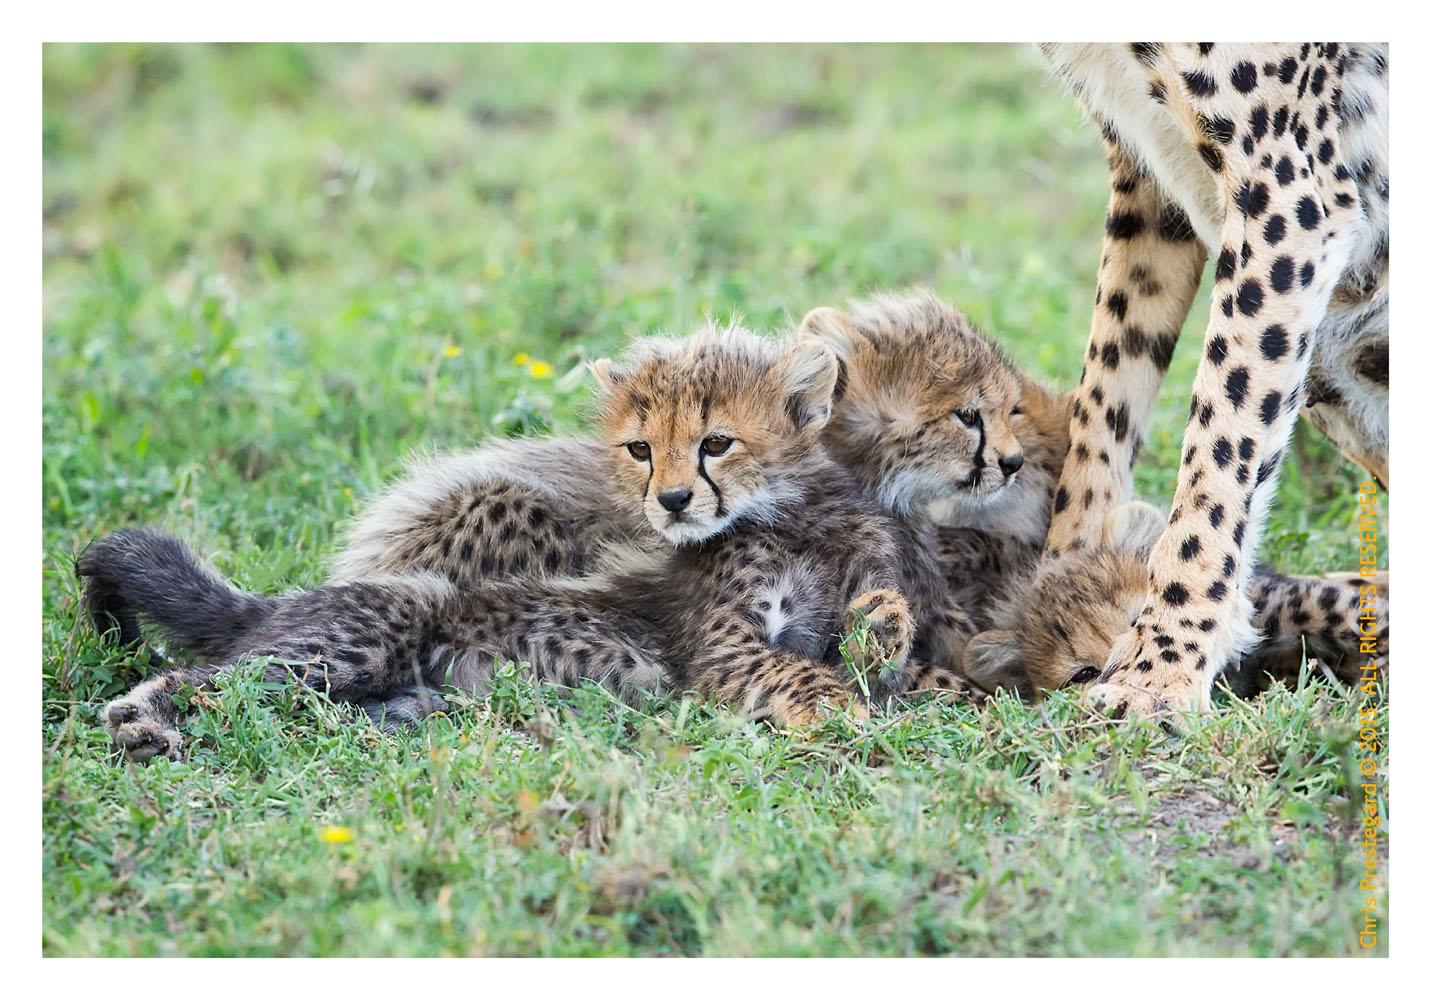 Cheetah9291